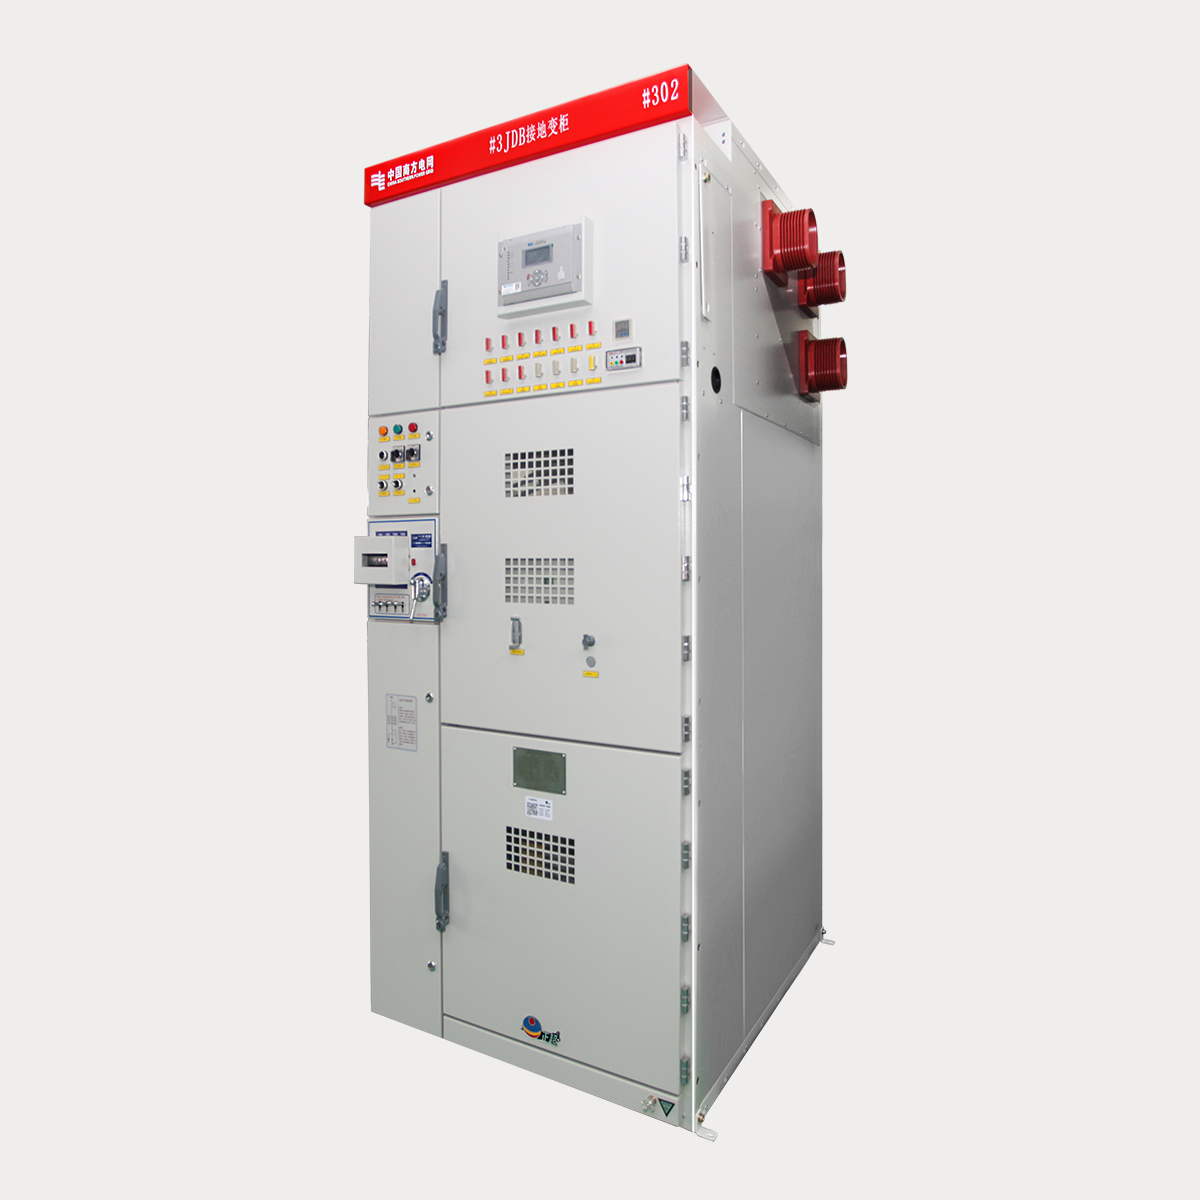 XGN2B-12 箱型固定式交流金属封闭开关设备(10kV固定式开关柜、10kV配网固定式开关柜)